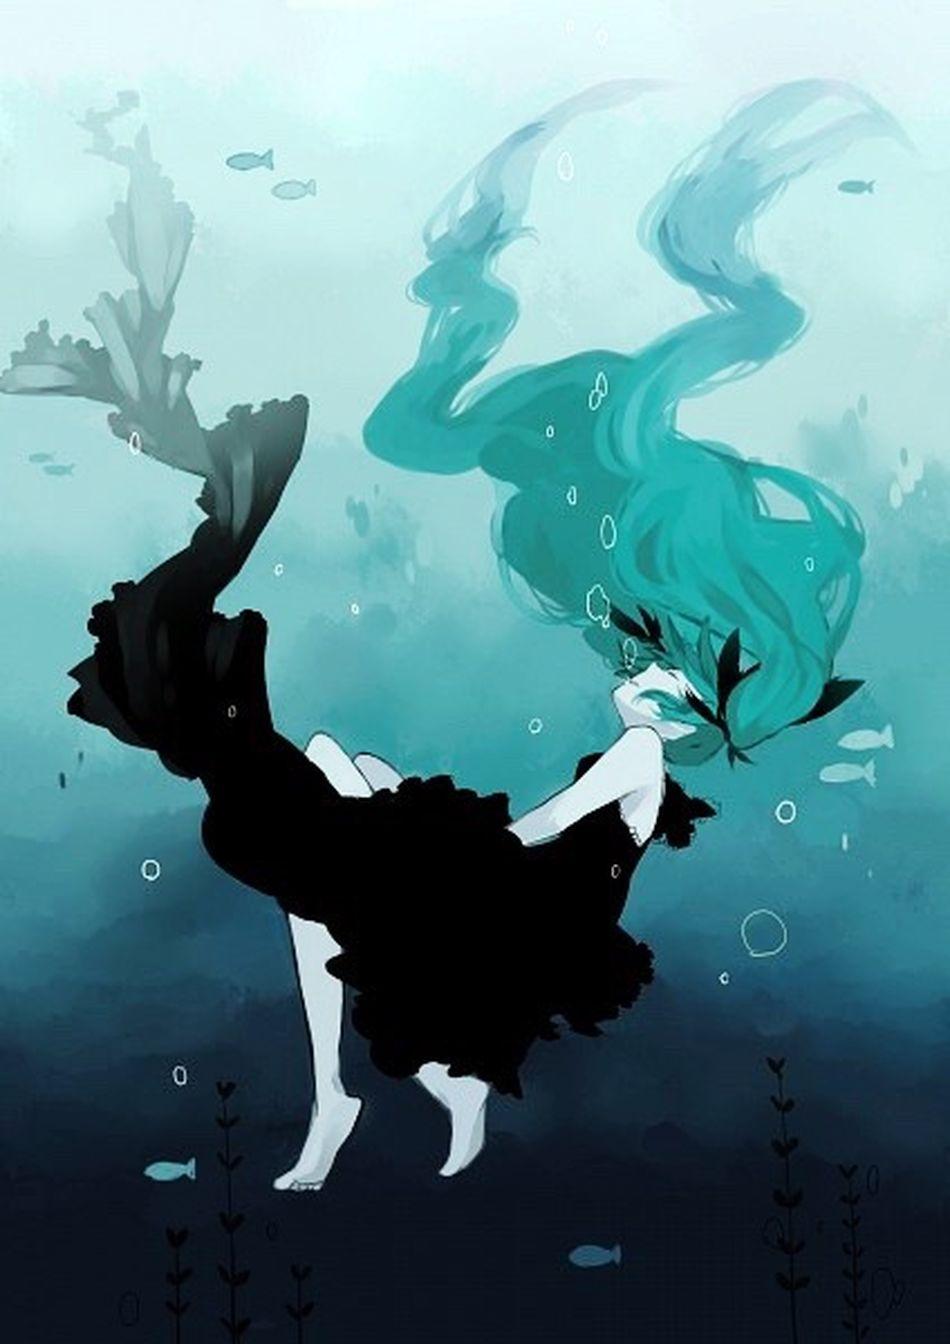 Deep sea girl Deep Sea Girl Anime Art аниме Море Meer Sea Ocian Vocaloid